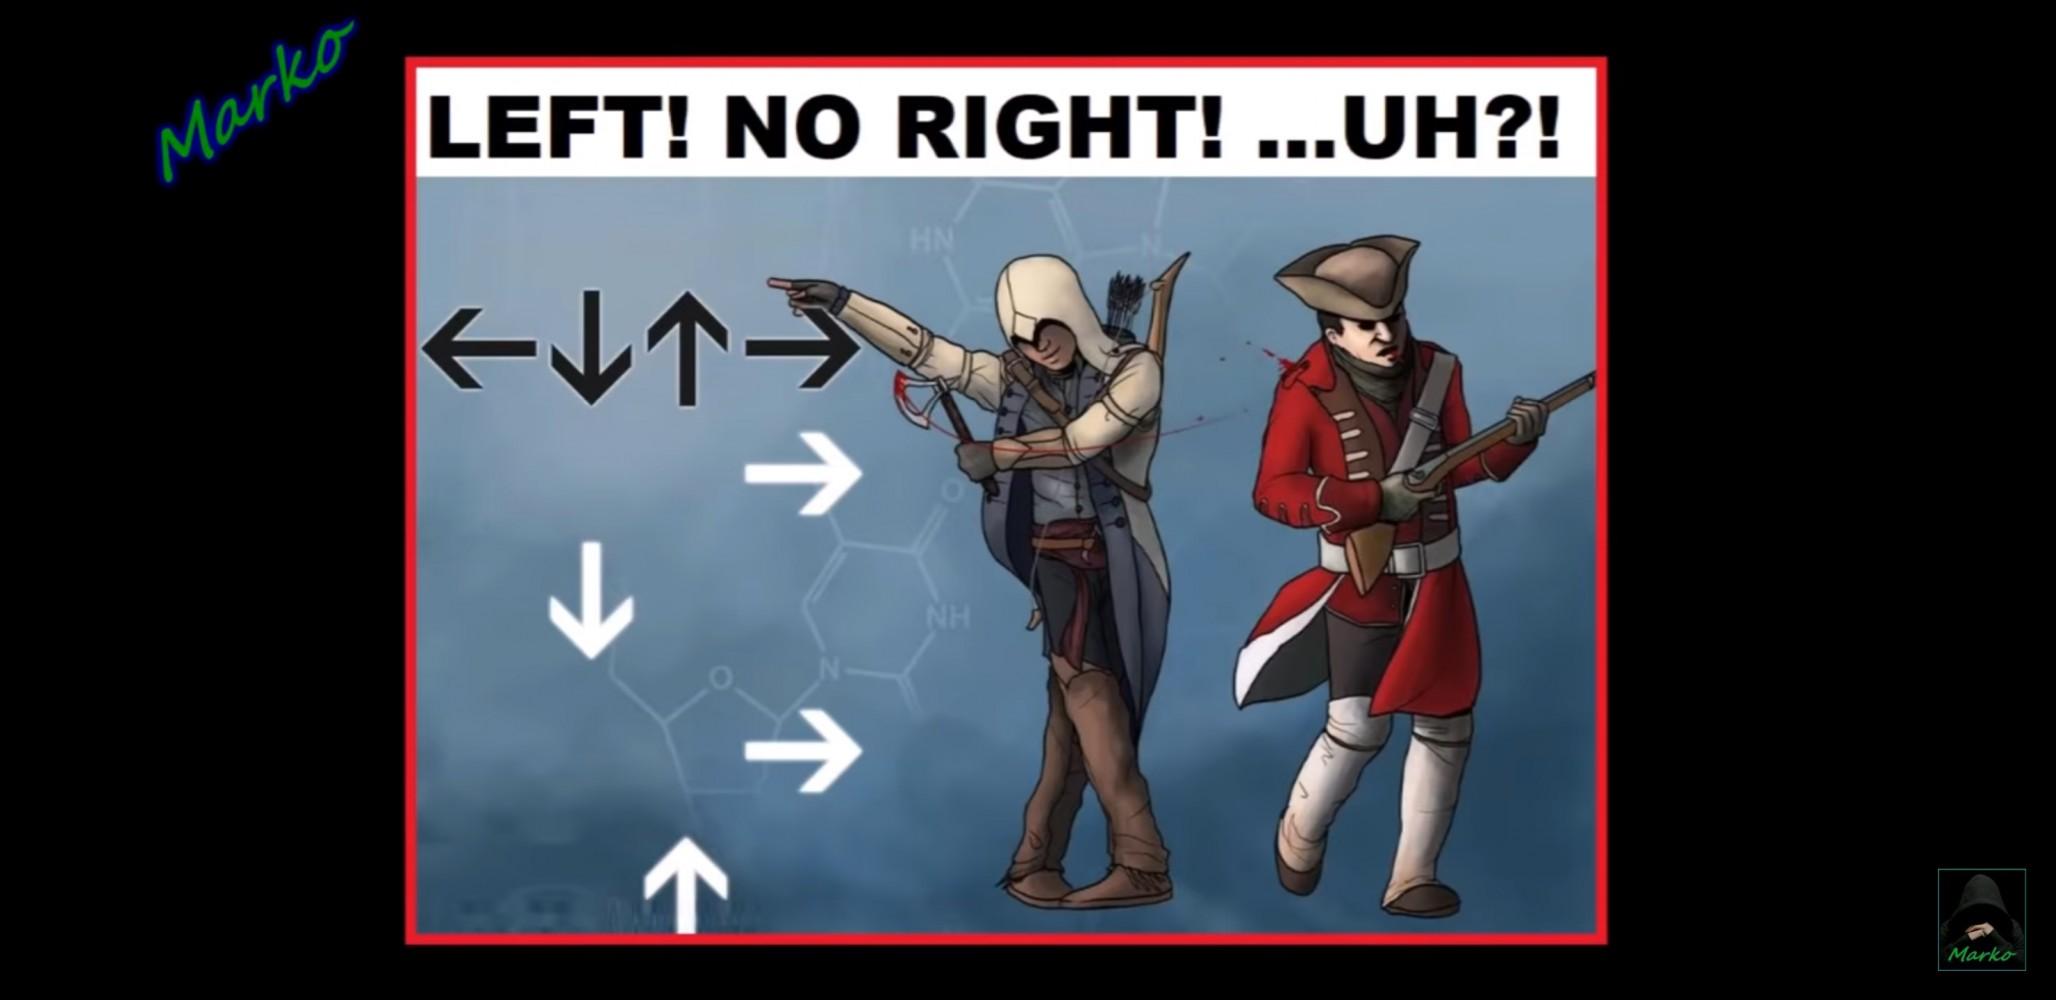 Pixilart Assassin S Creed Meme 4 Uploaded By Drdewgong